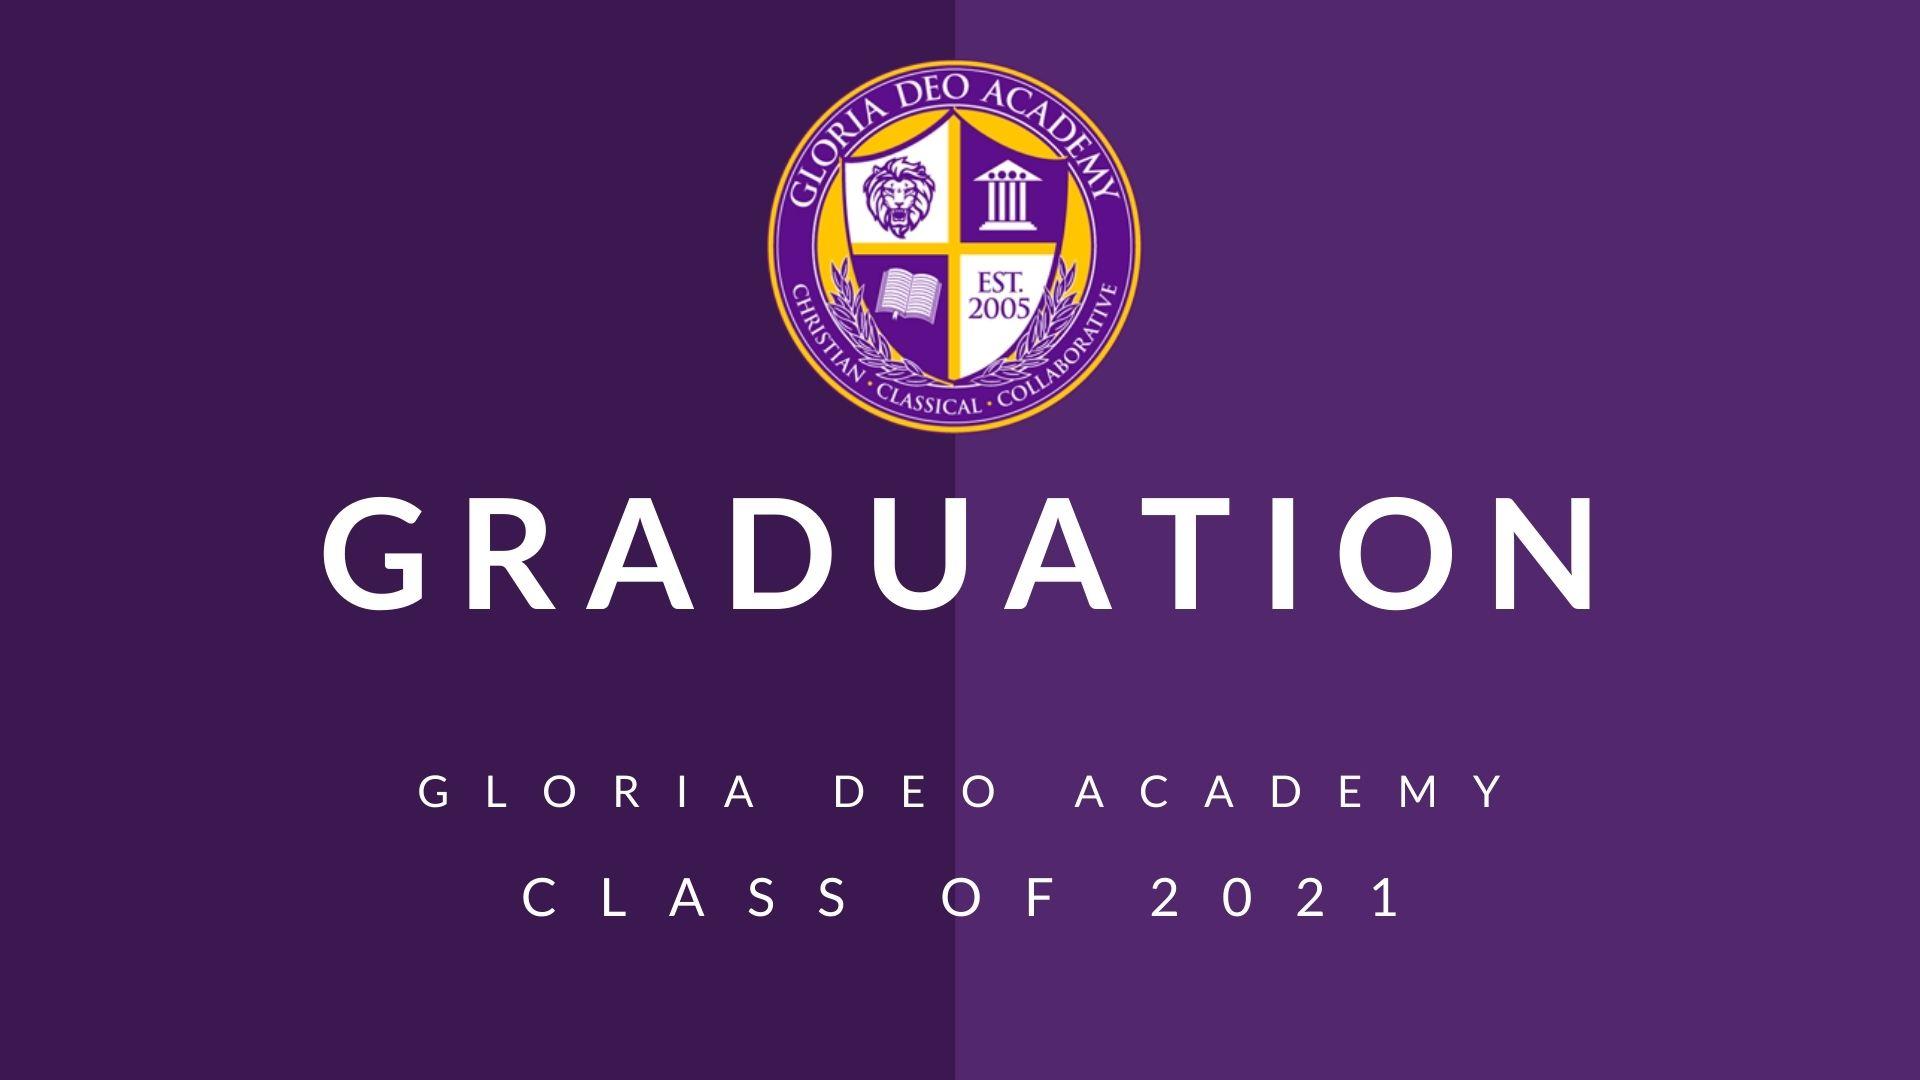 Gloria Deo Academy Graduation 2021